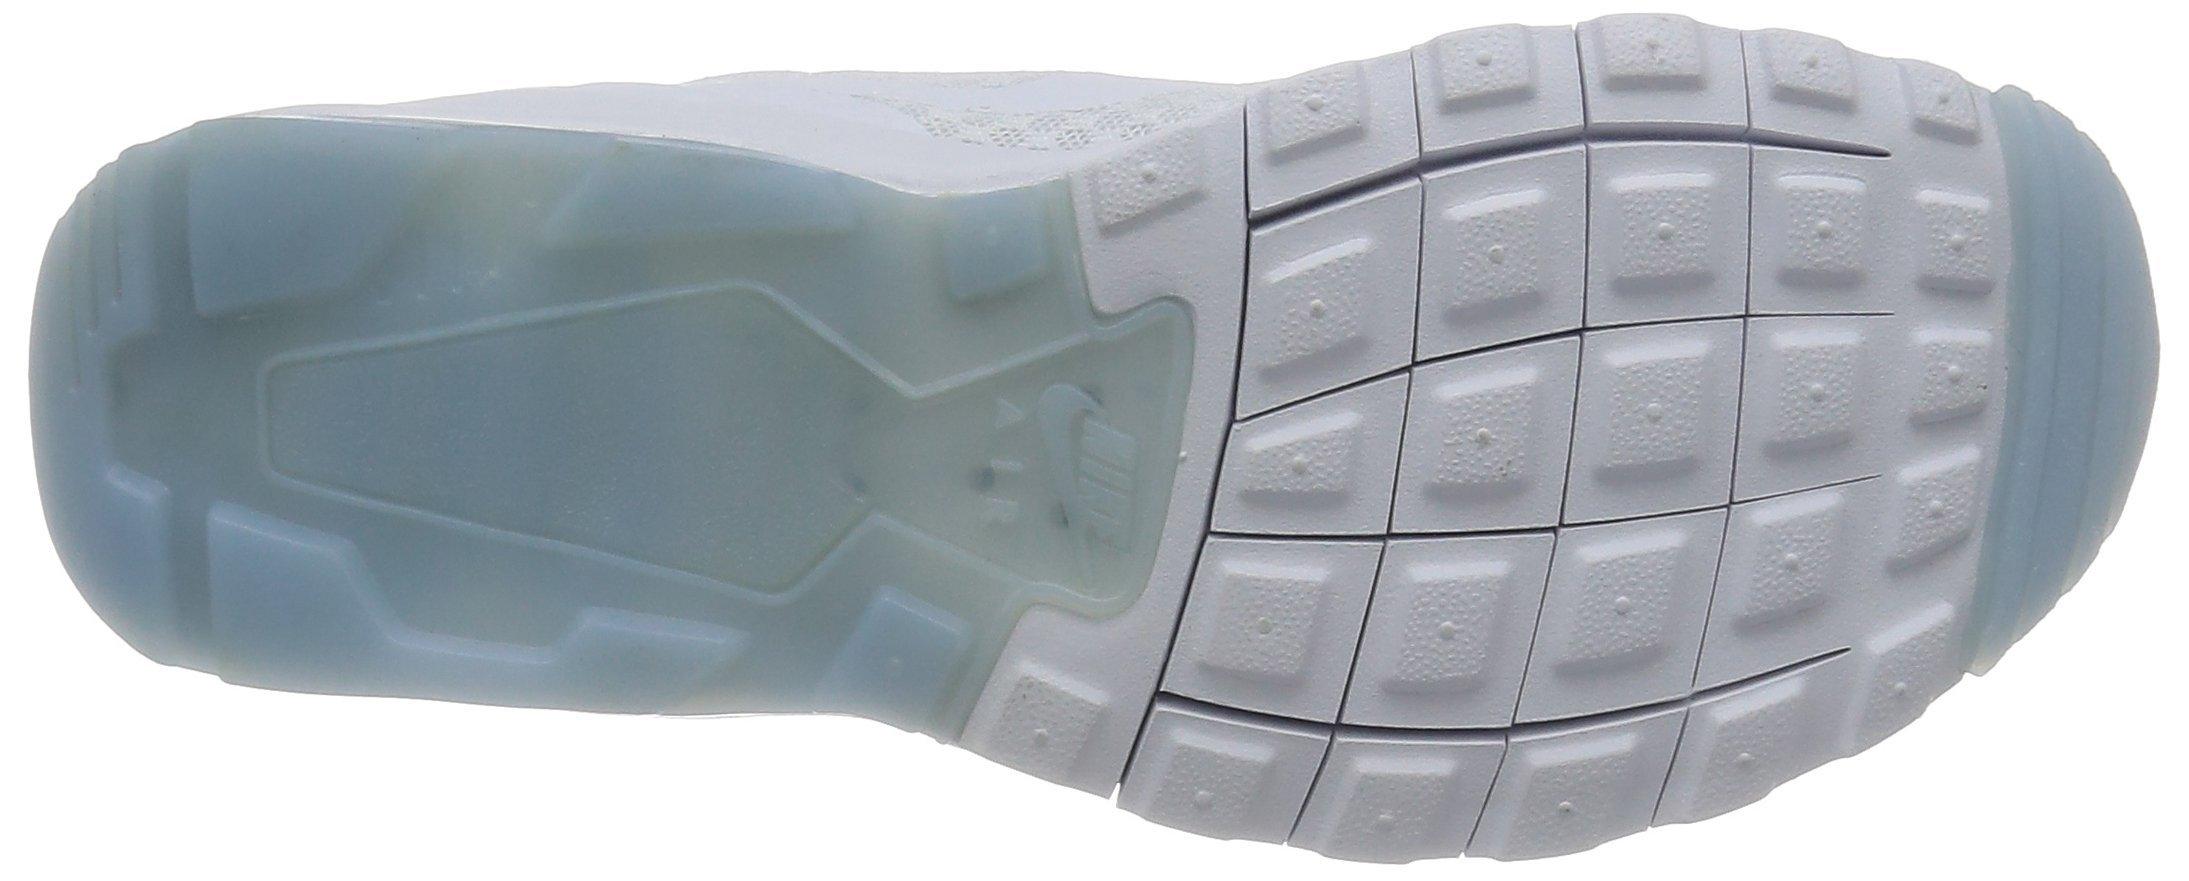 NIKE Women's Air Max Motion LW Running Shoe, White/White, 8.5 M US by NIKE (Image #3)